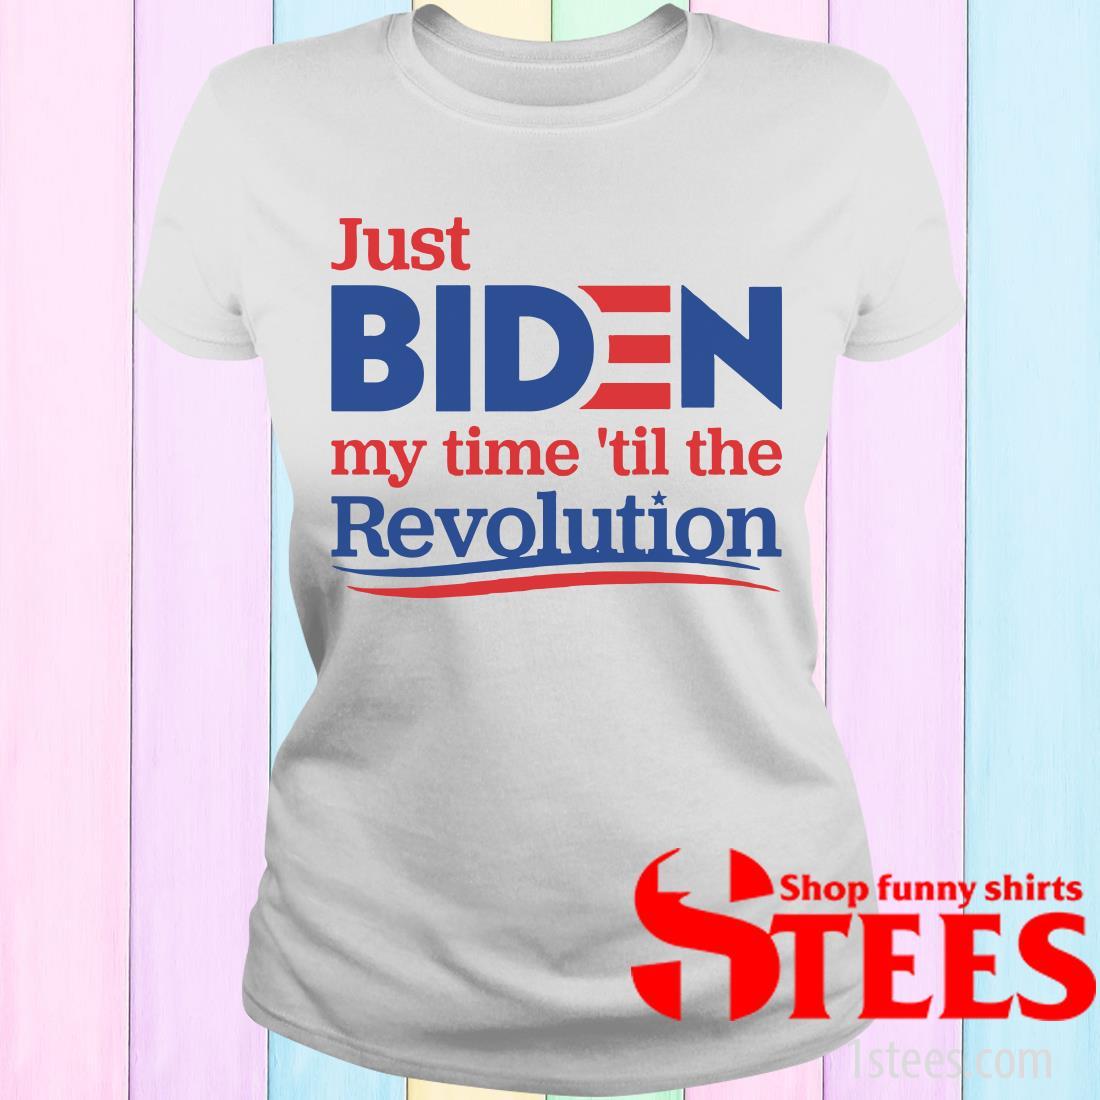 Just Biden My Time 'til The Revolution Women's T-Shirt